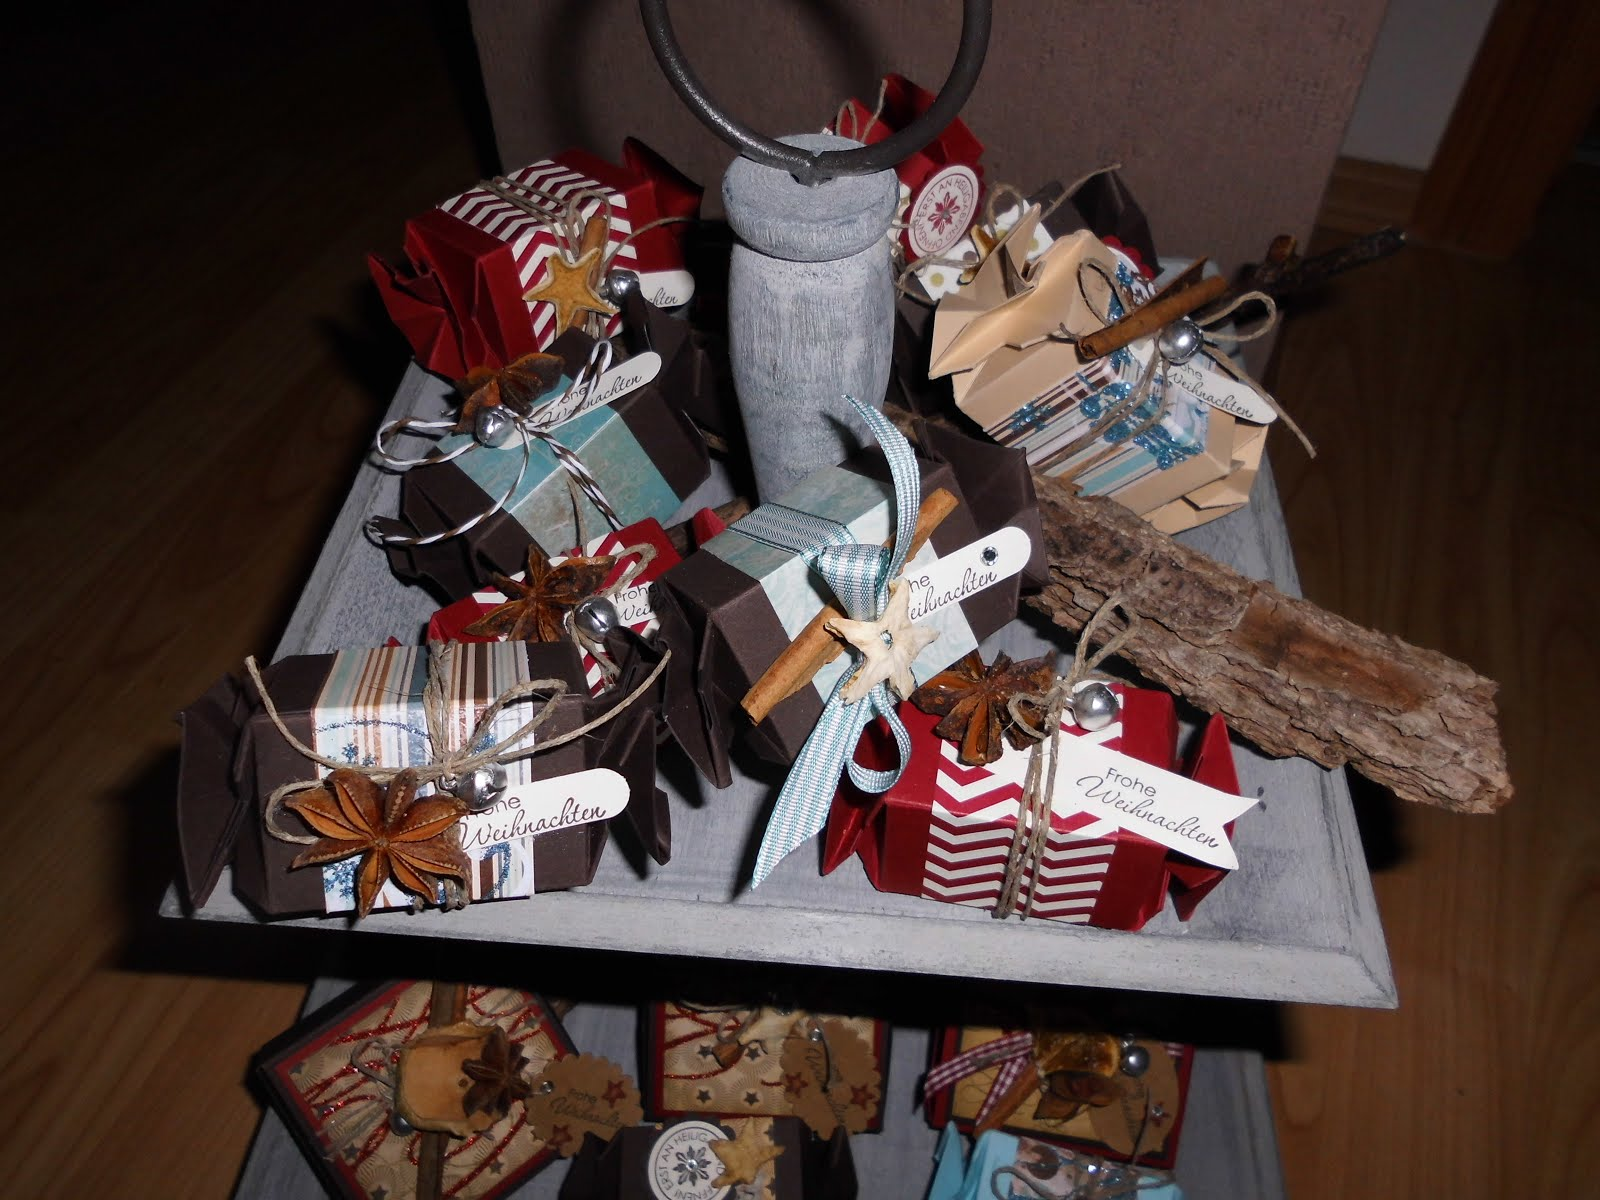 tanjas kreativecke jede menge weihnachtliche. Black Bedroom Furniture Sets. Home Design Ideas